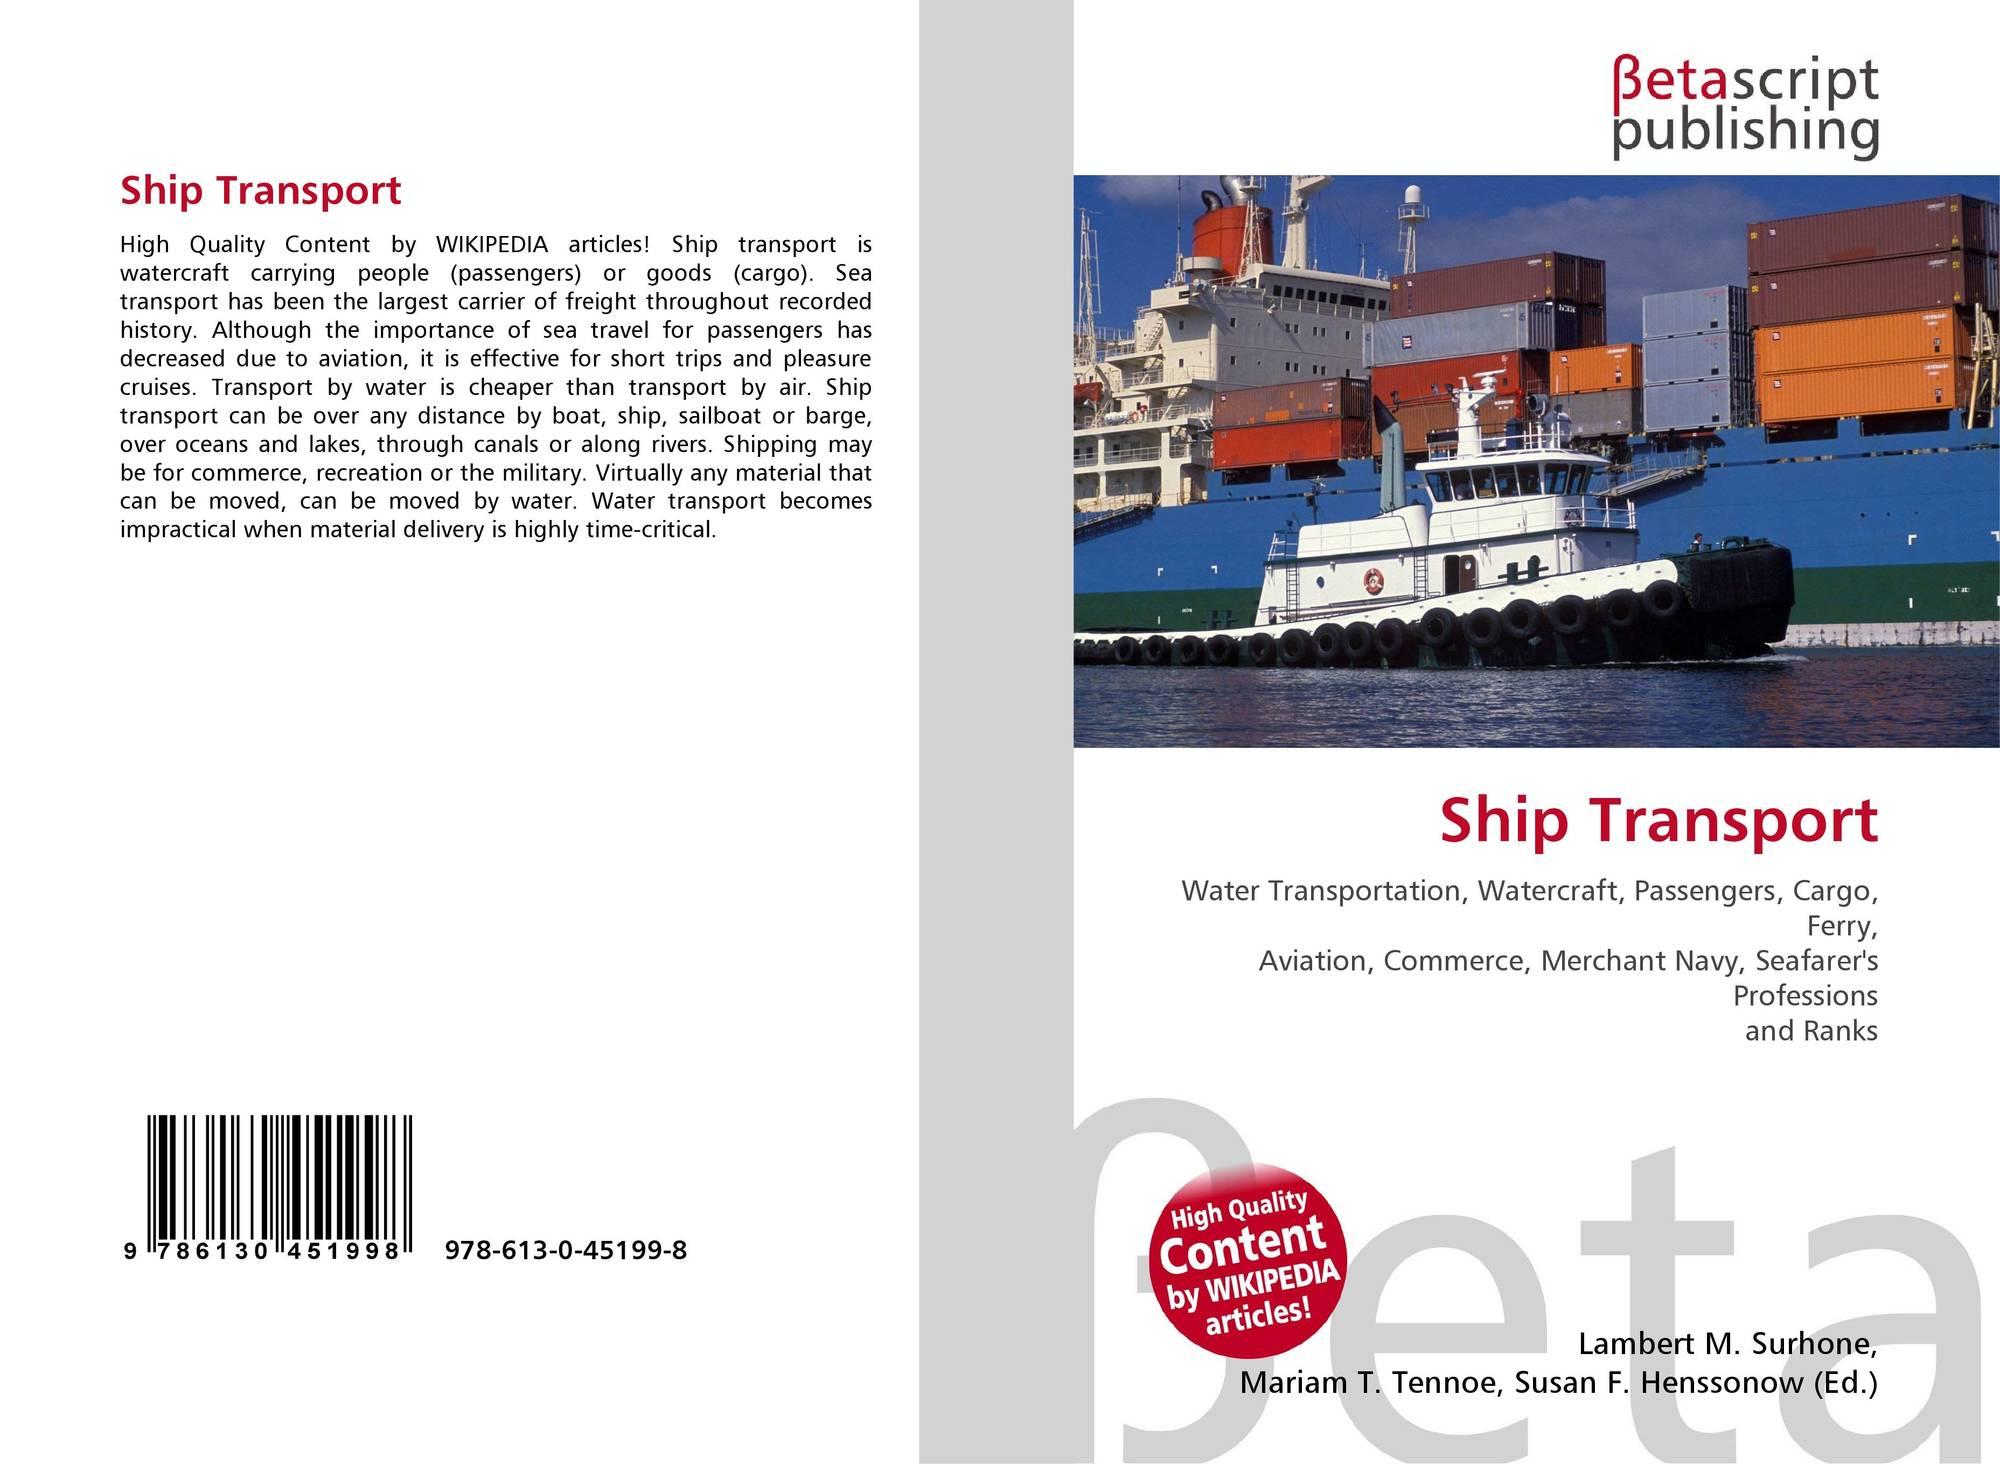 Ship Transport, 978-613-0-45199-8, 6130451997 ,9786130451998